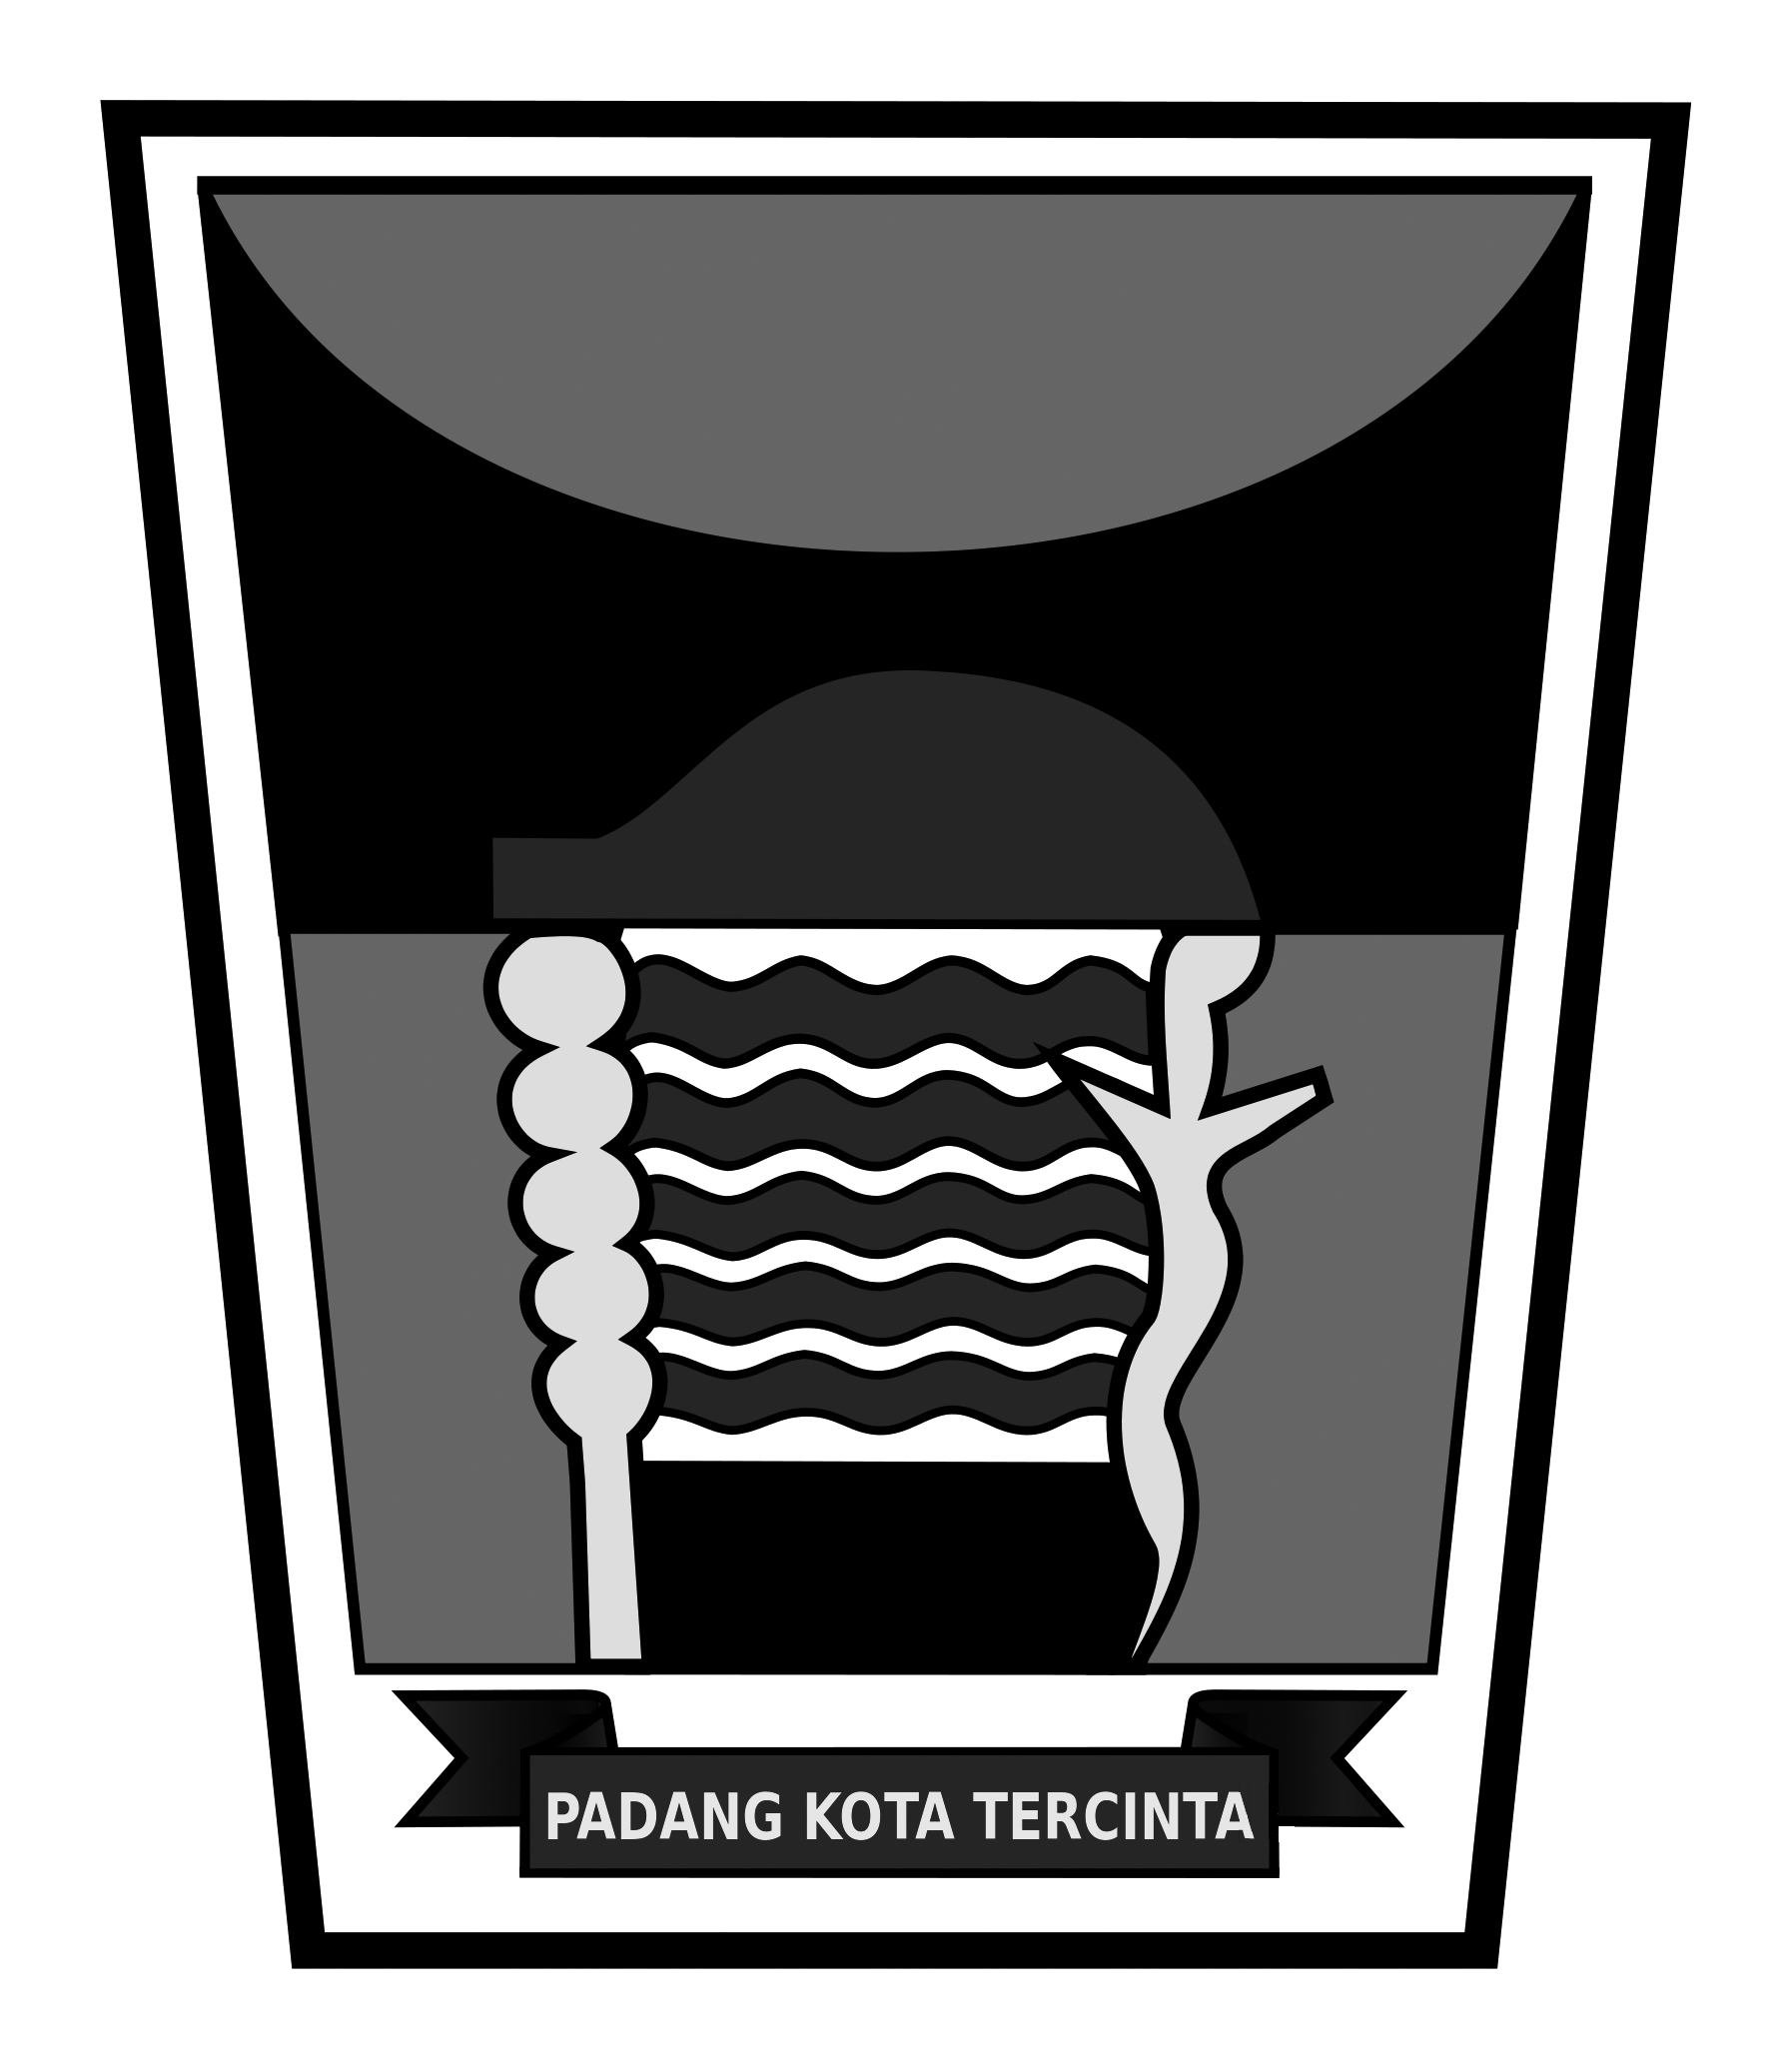 Logo Kota Padang (Provinsi Sumatera Barat) Original Grayscale